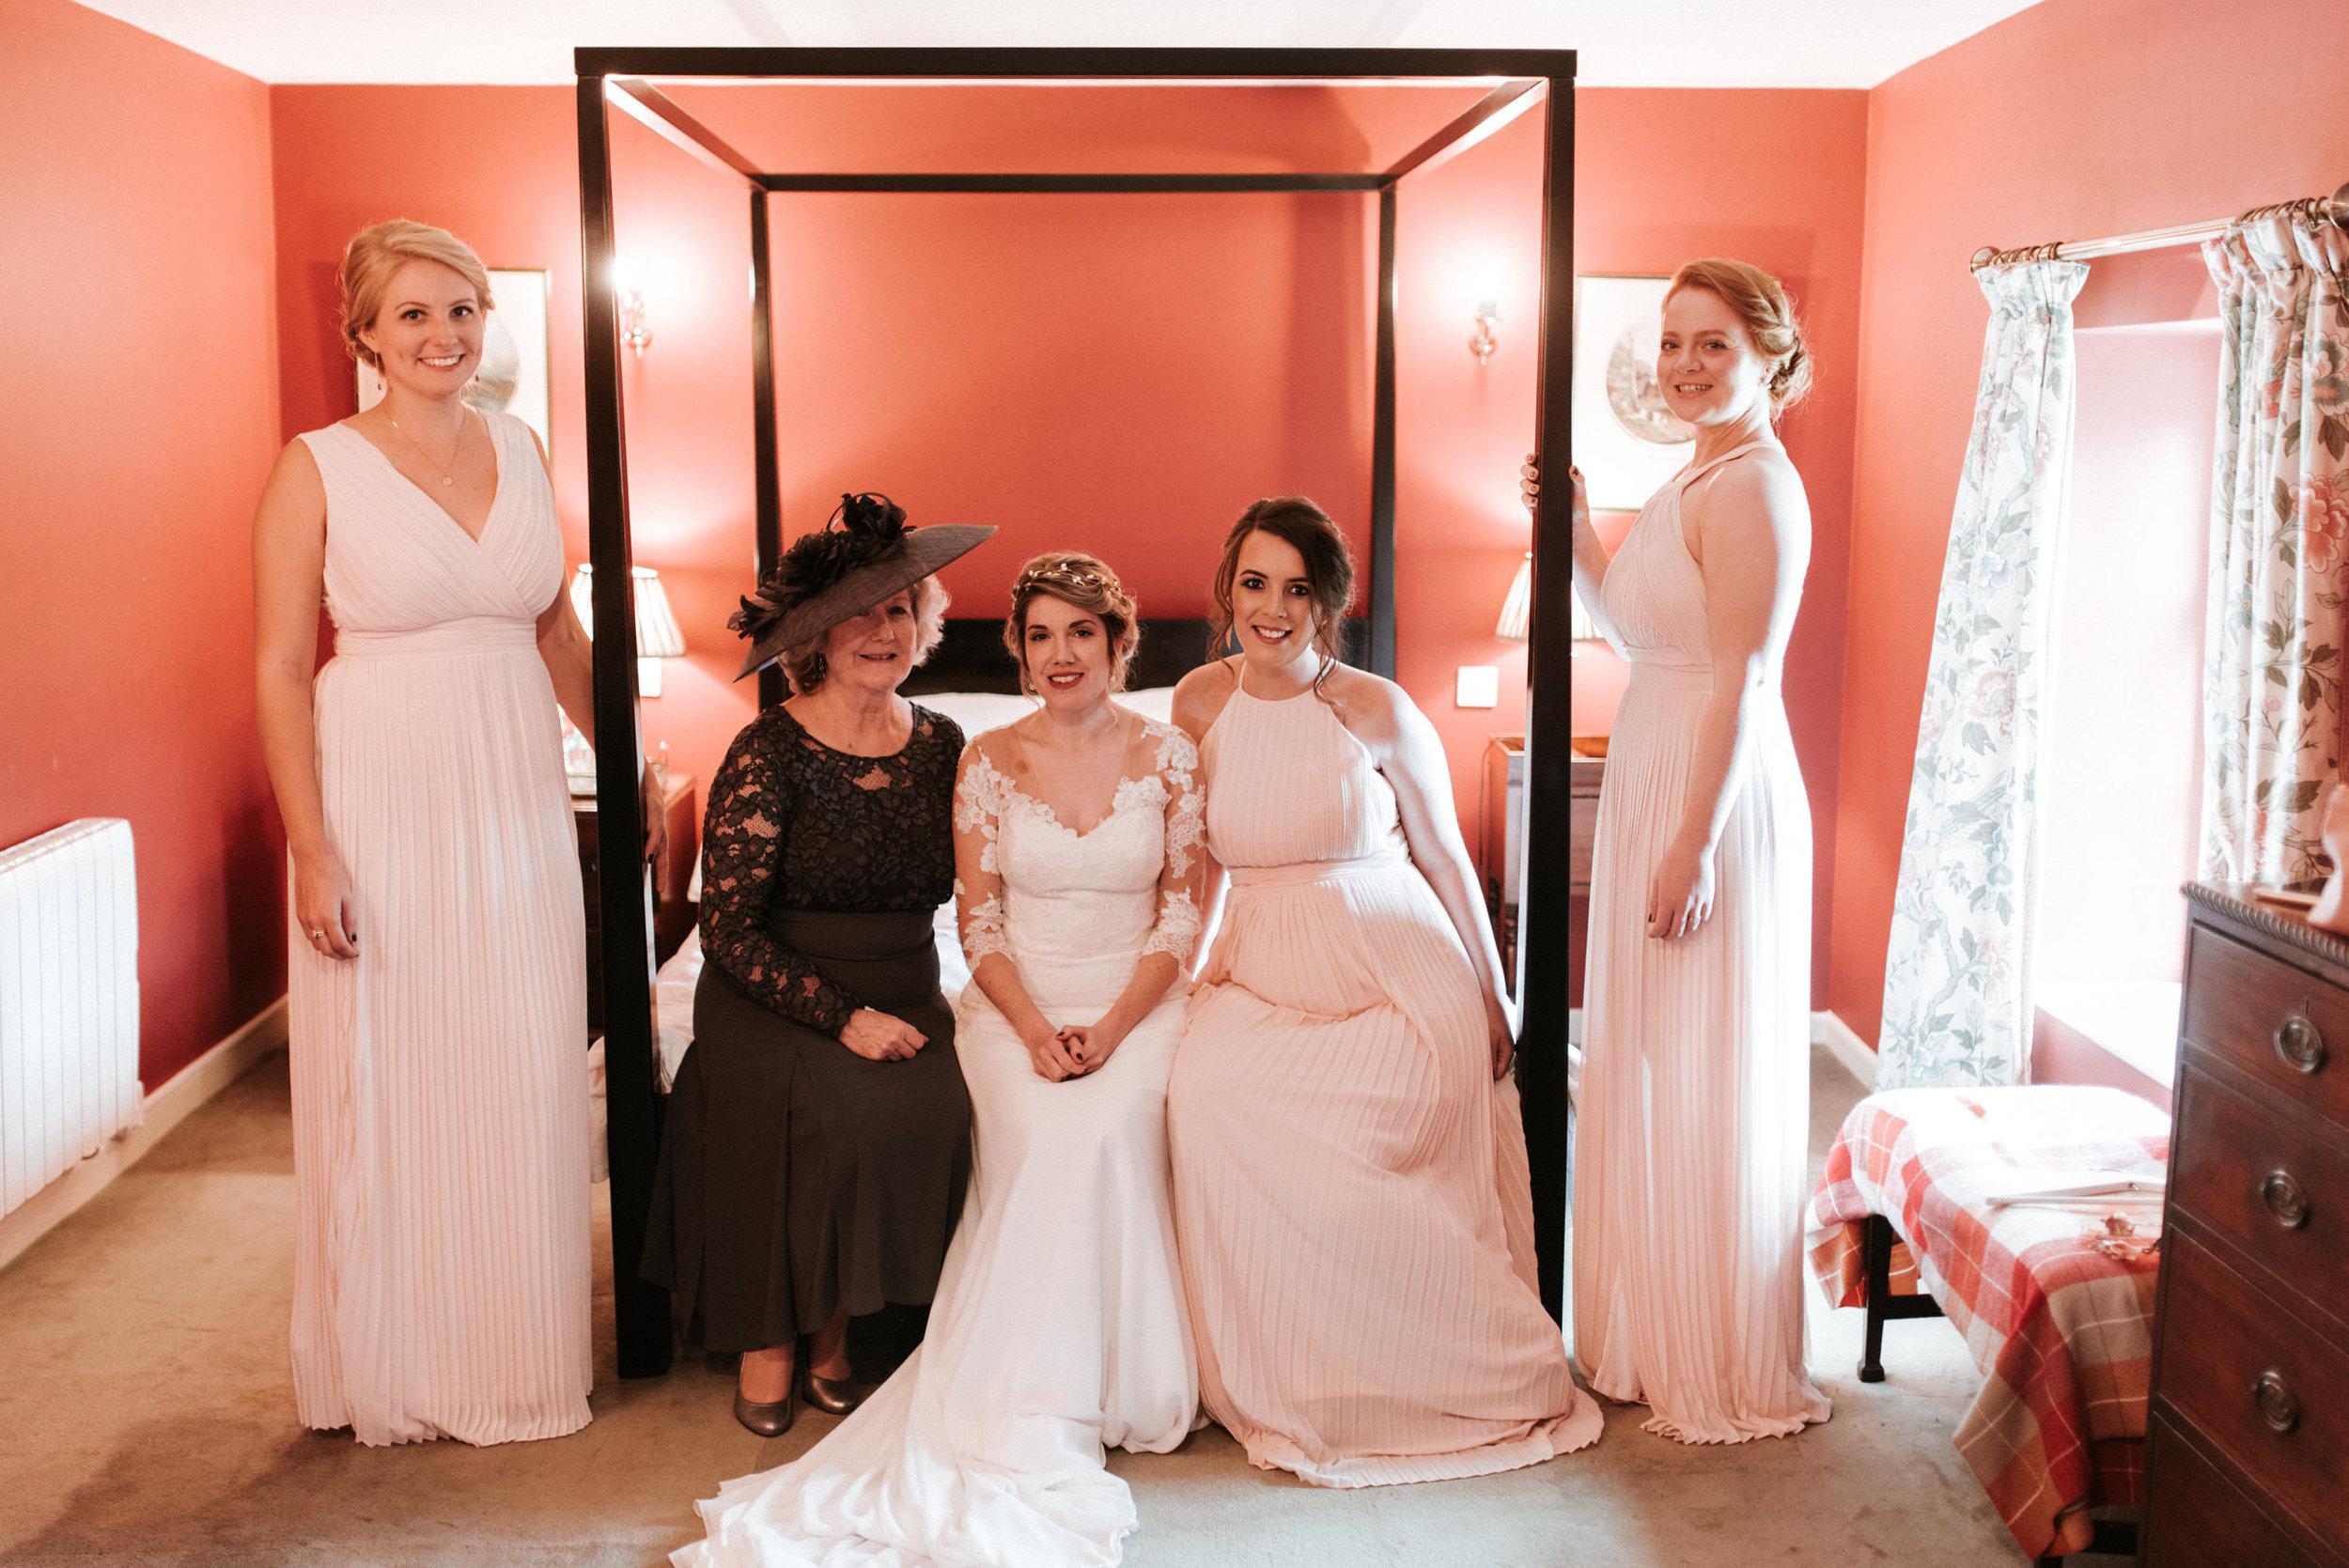 lissanoure castle wedding, northern ireland wedding photographer, romantic northern irish wedding venue, castle wedding ireland, natural wedding photography ni (38).jpg